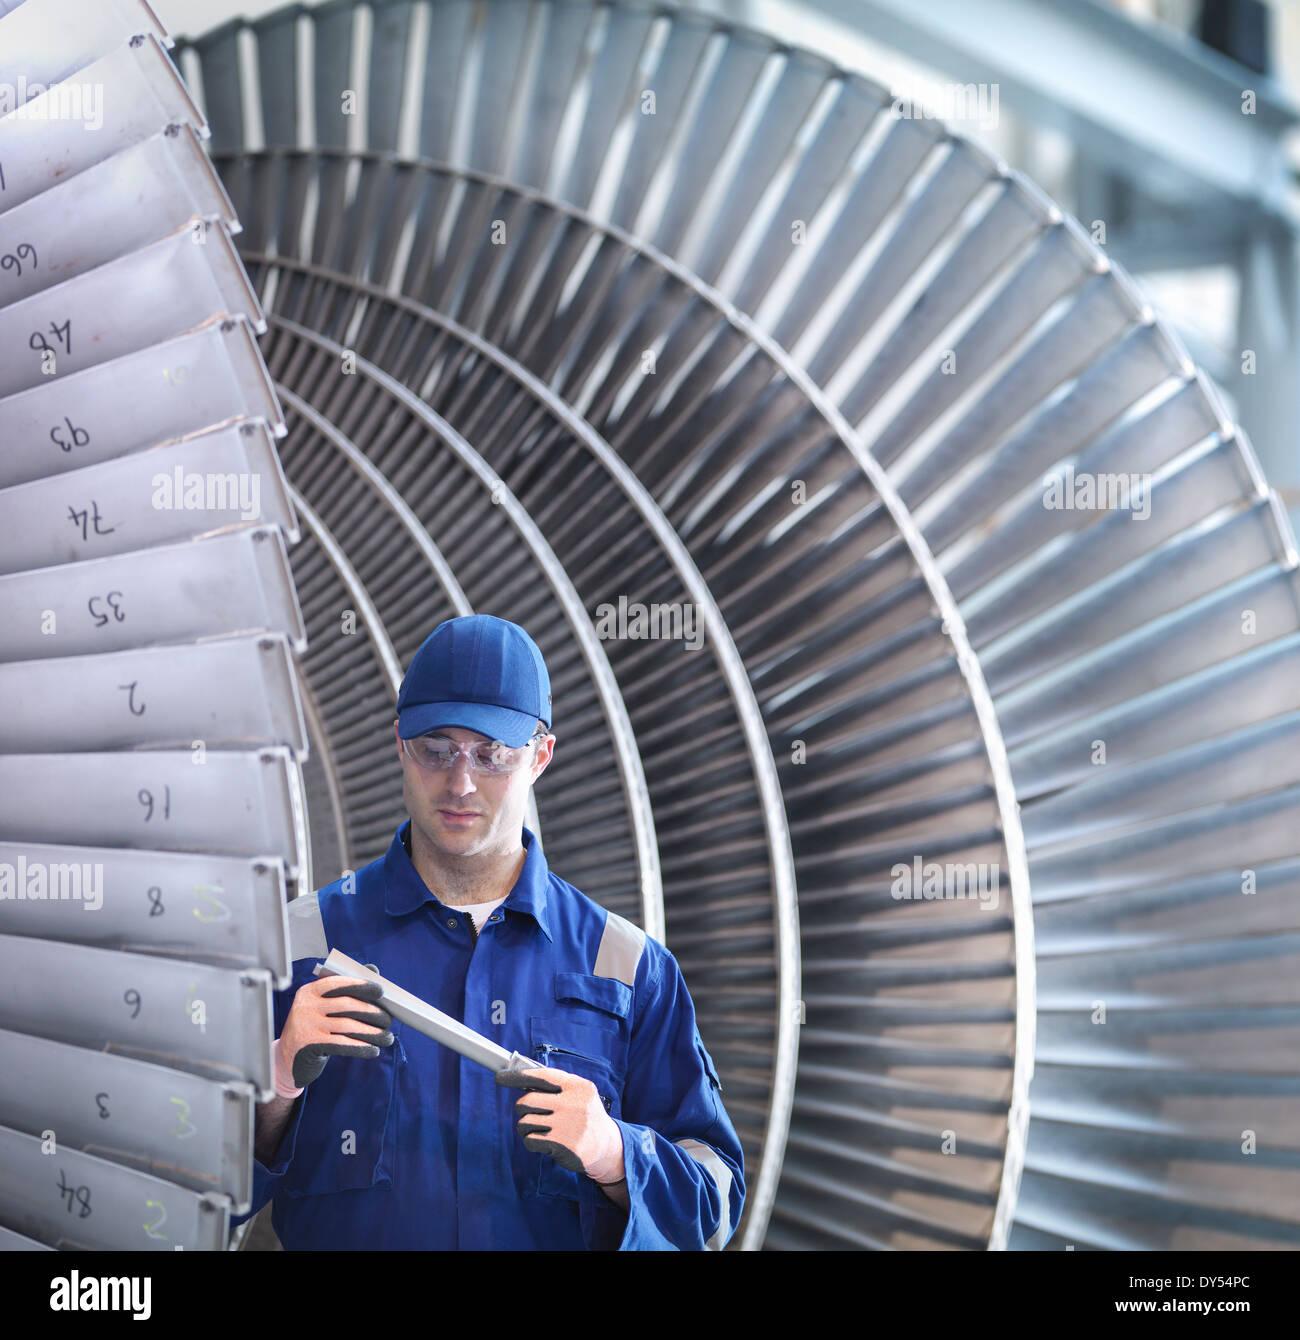 Engineer inspecting steam turbine blade in workshop - Stock Image